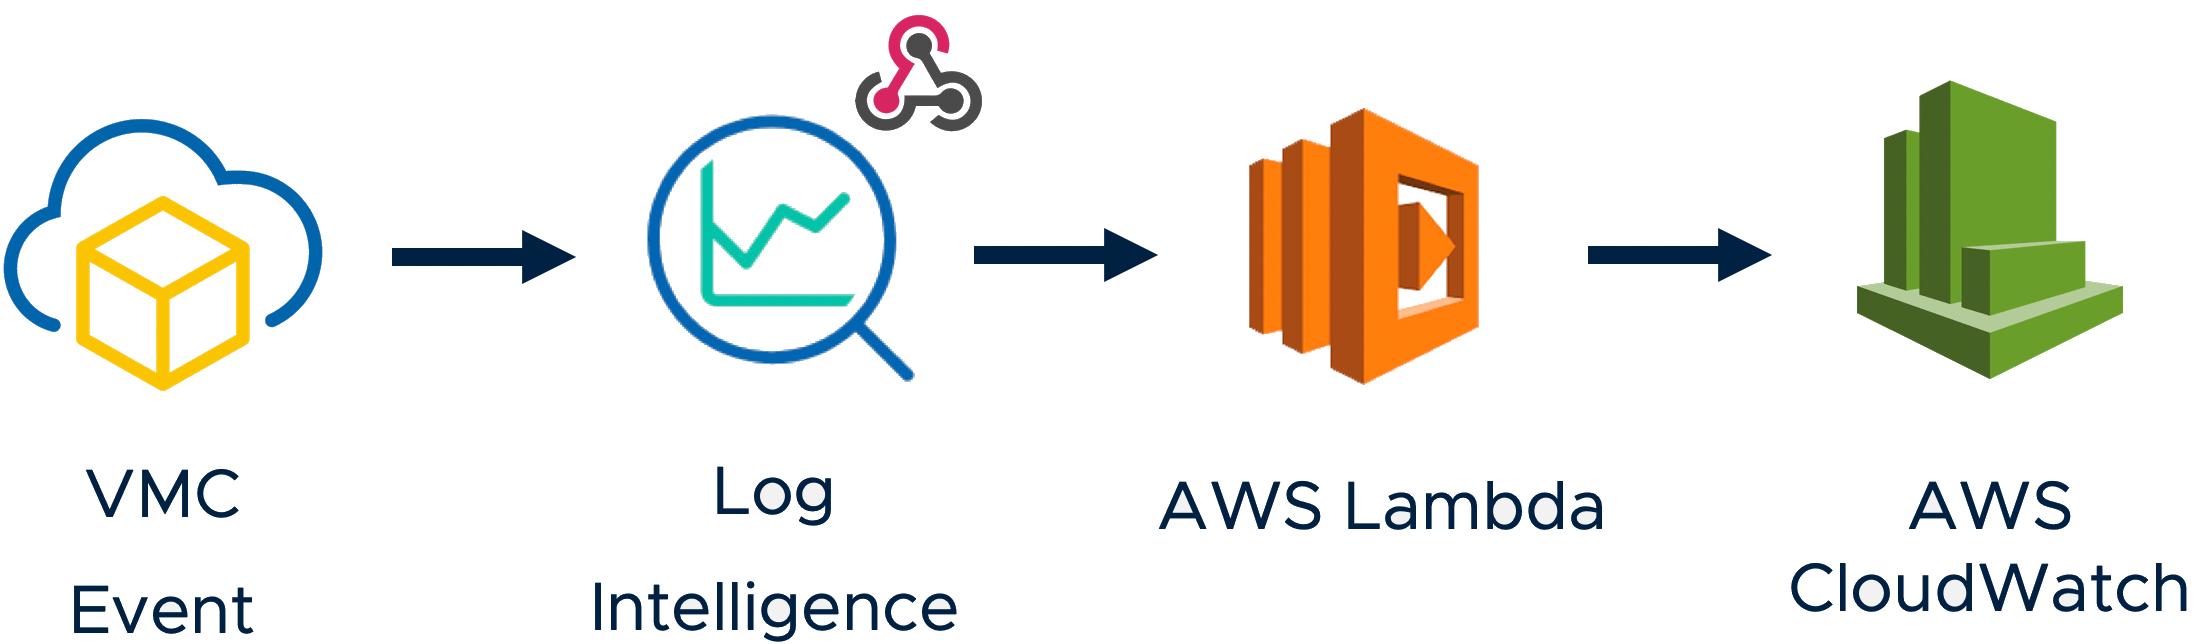 Forwarding VMC Events to AWS Lambda/CloudWatch using Log